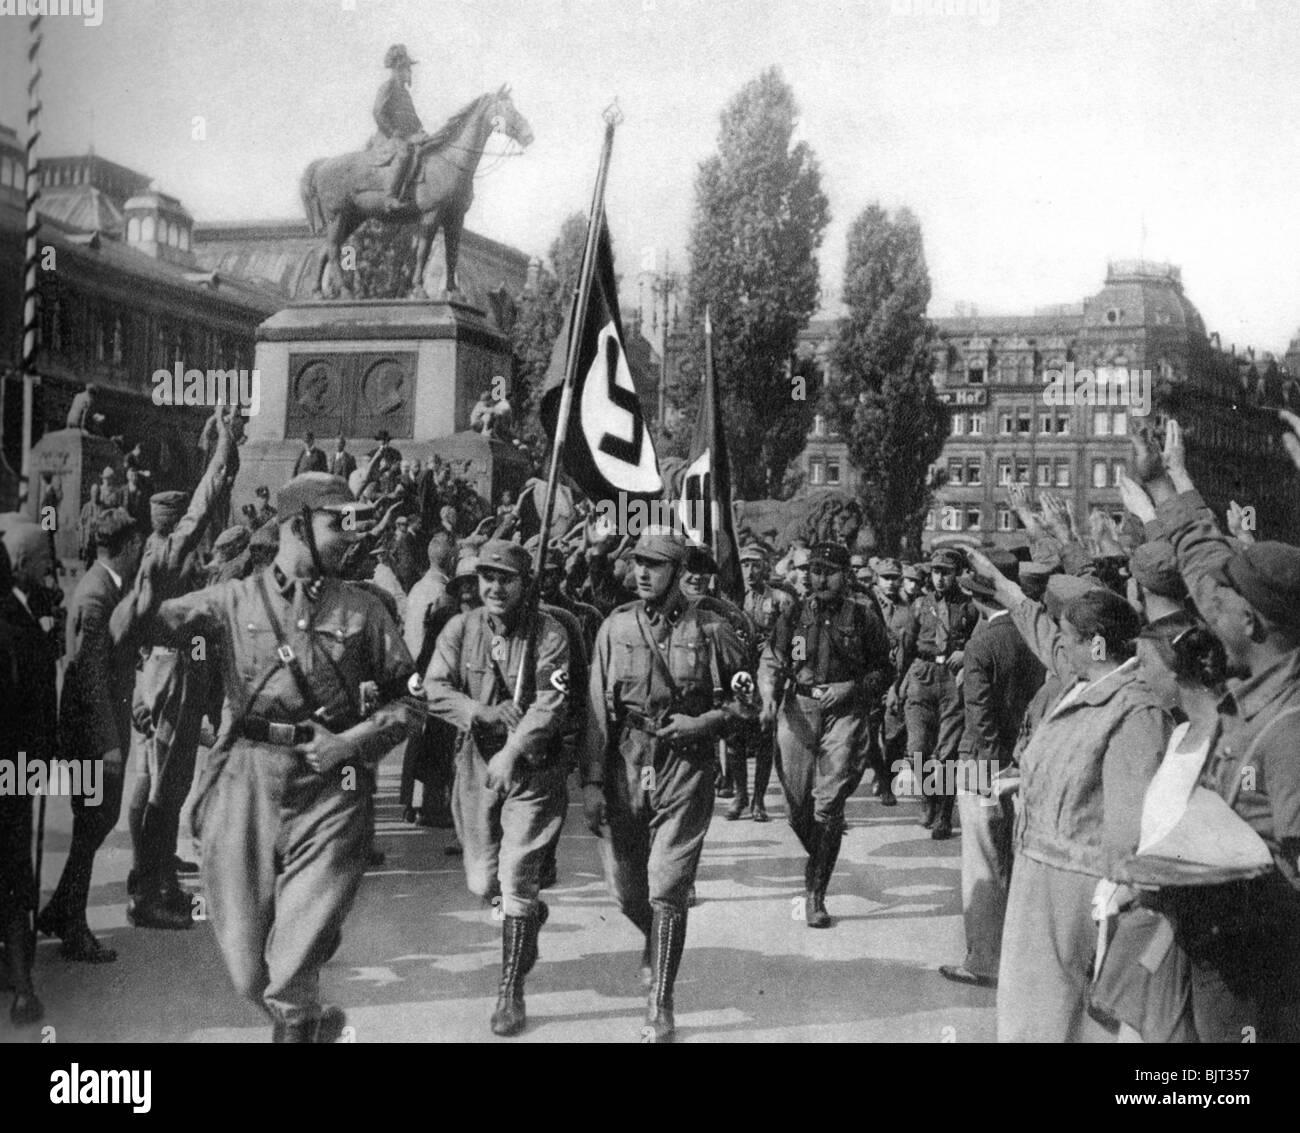 Horst Wessel (1907-1930), German Nazi activist, Nuremberg, 1929 (1933). - Stock Image